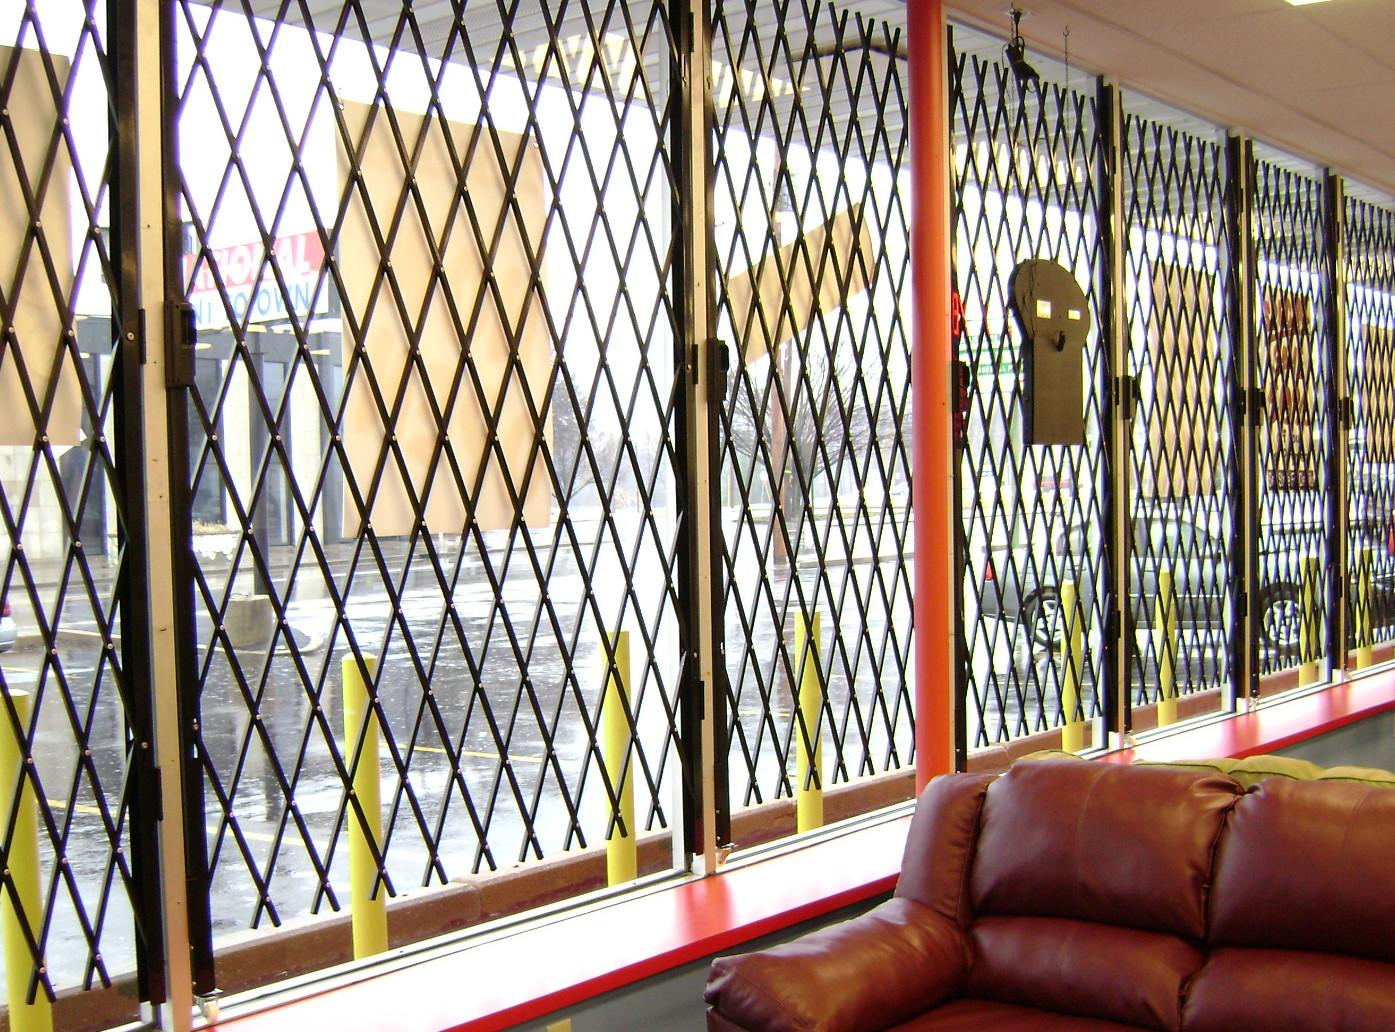 DIY Gates - S04™ - Security Doors | Security Doors ...